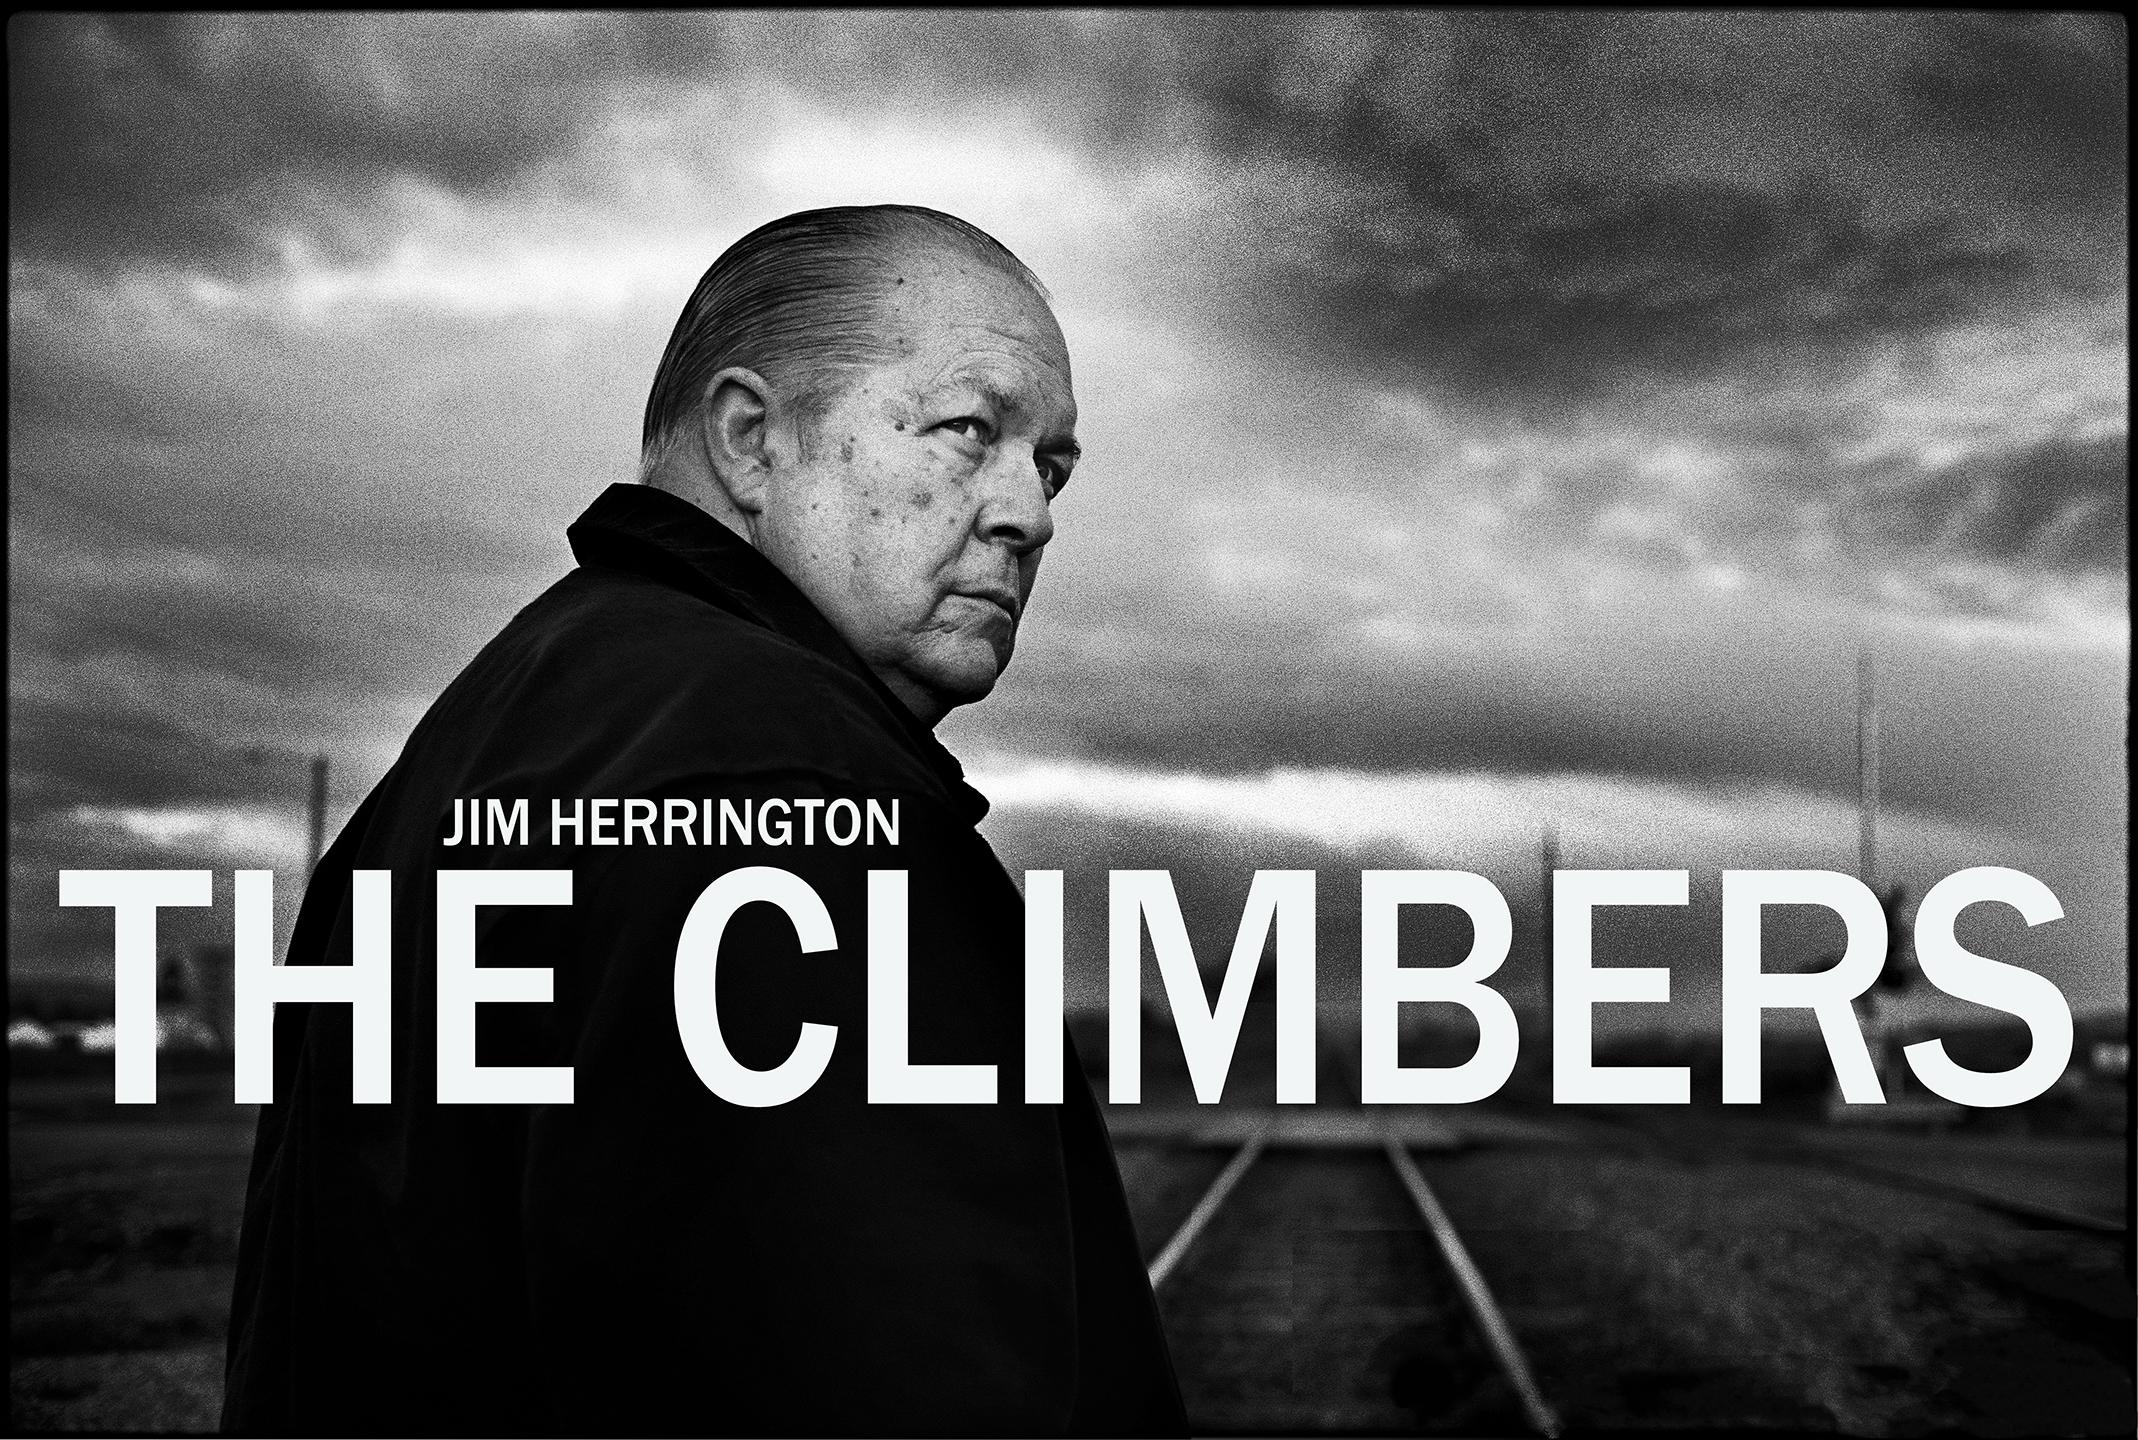 The Climbers book by Jim Herrington